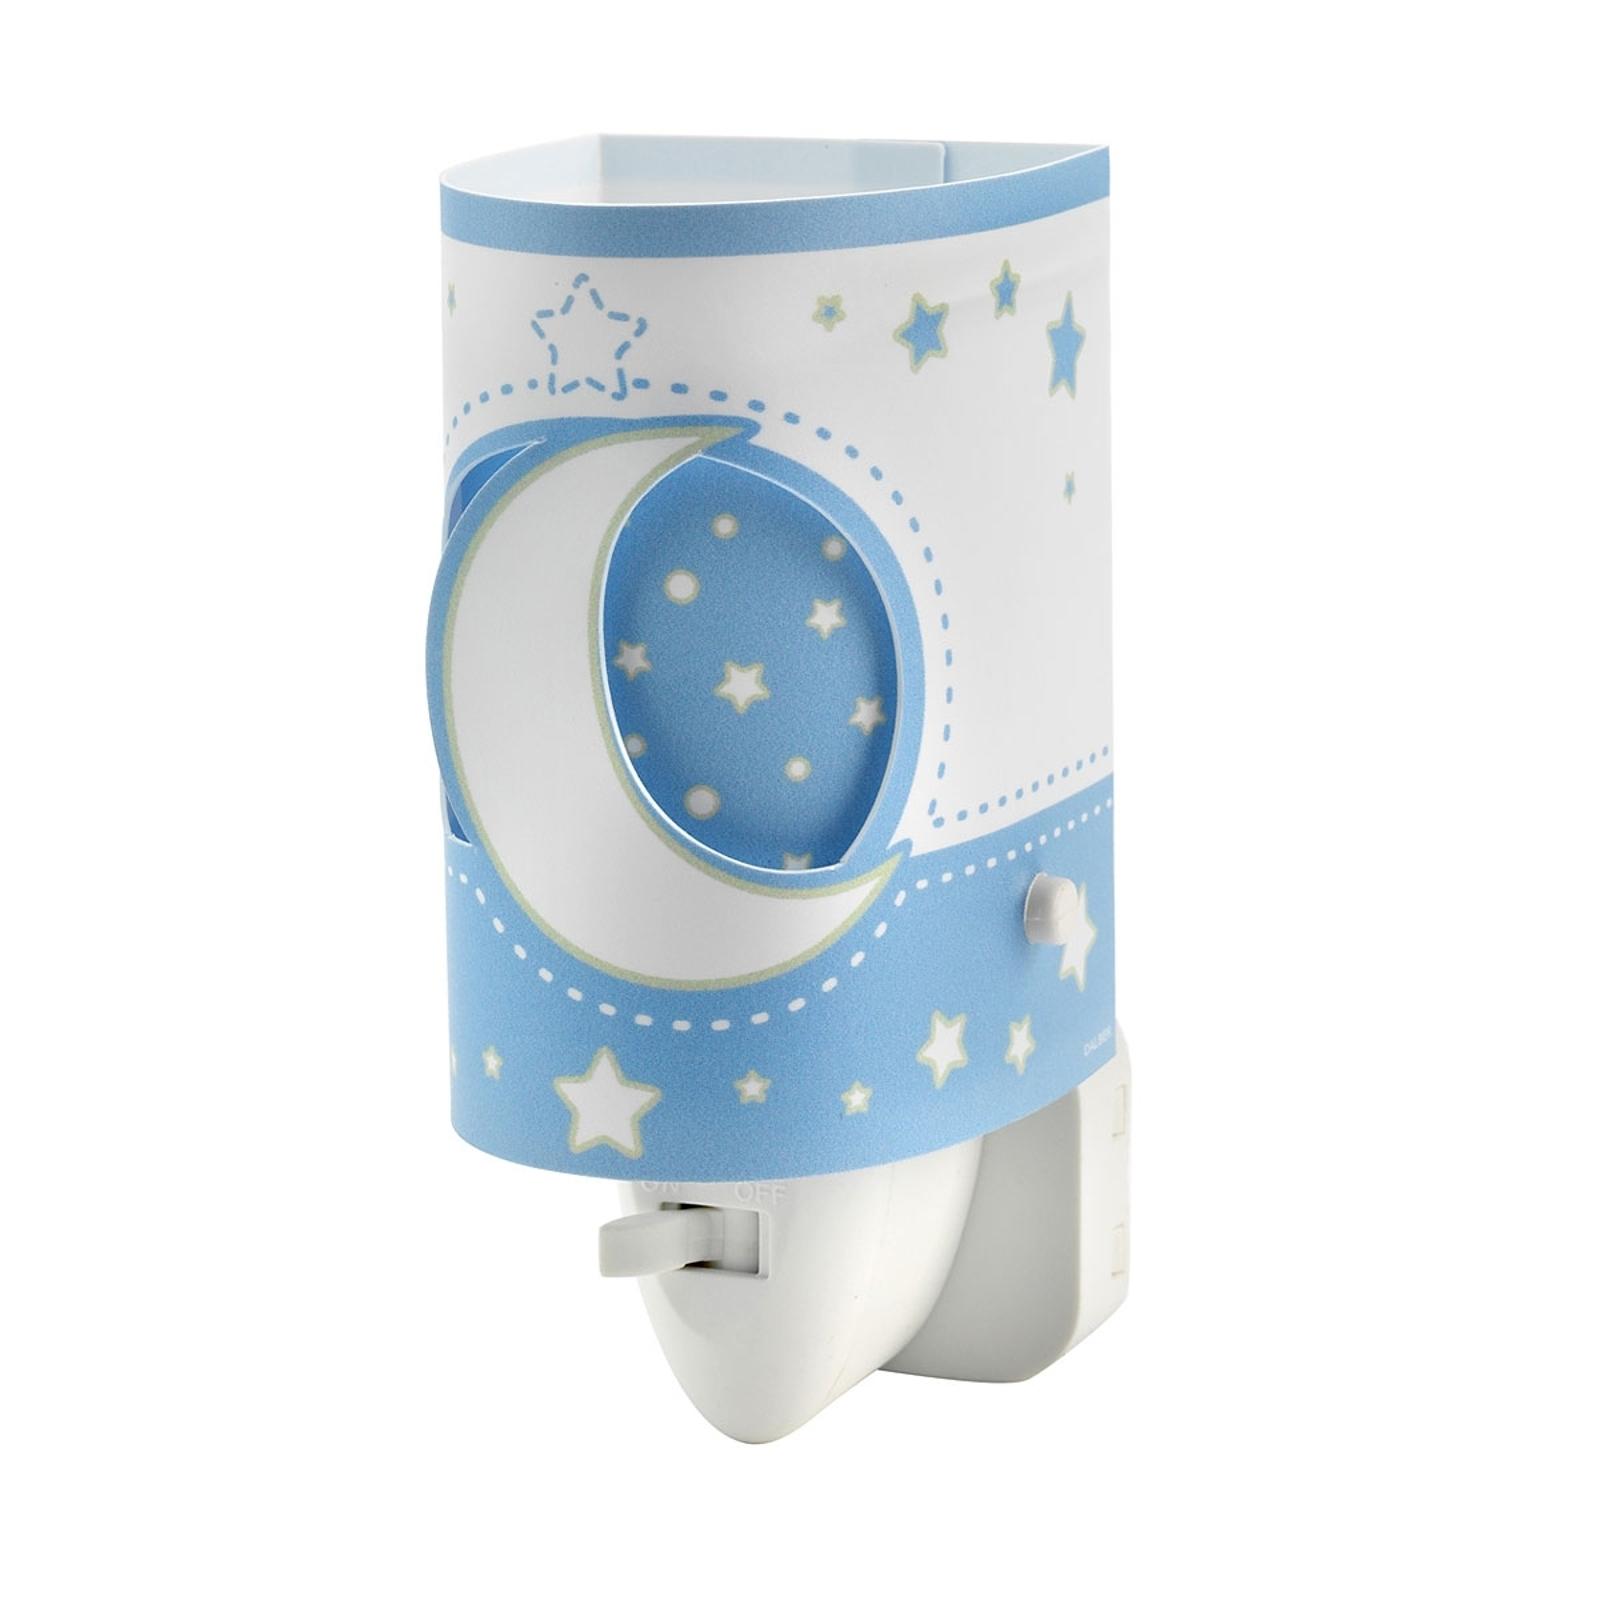 Veilleuse LED Stars pour bébé bleu clair